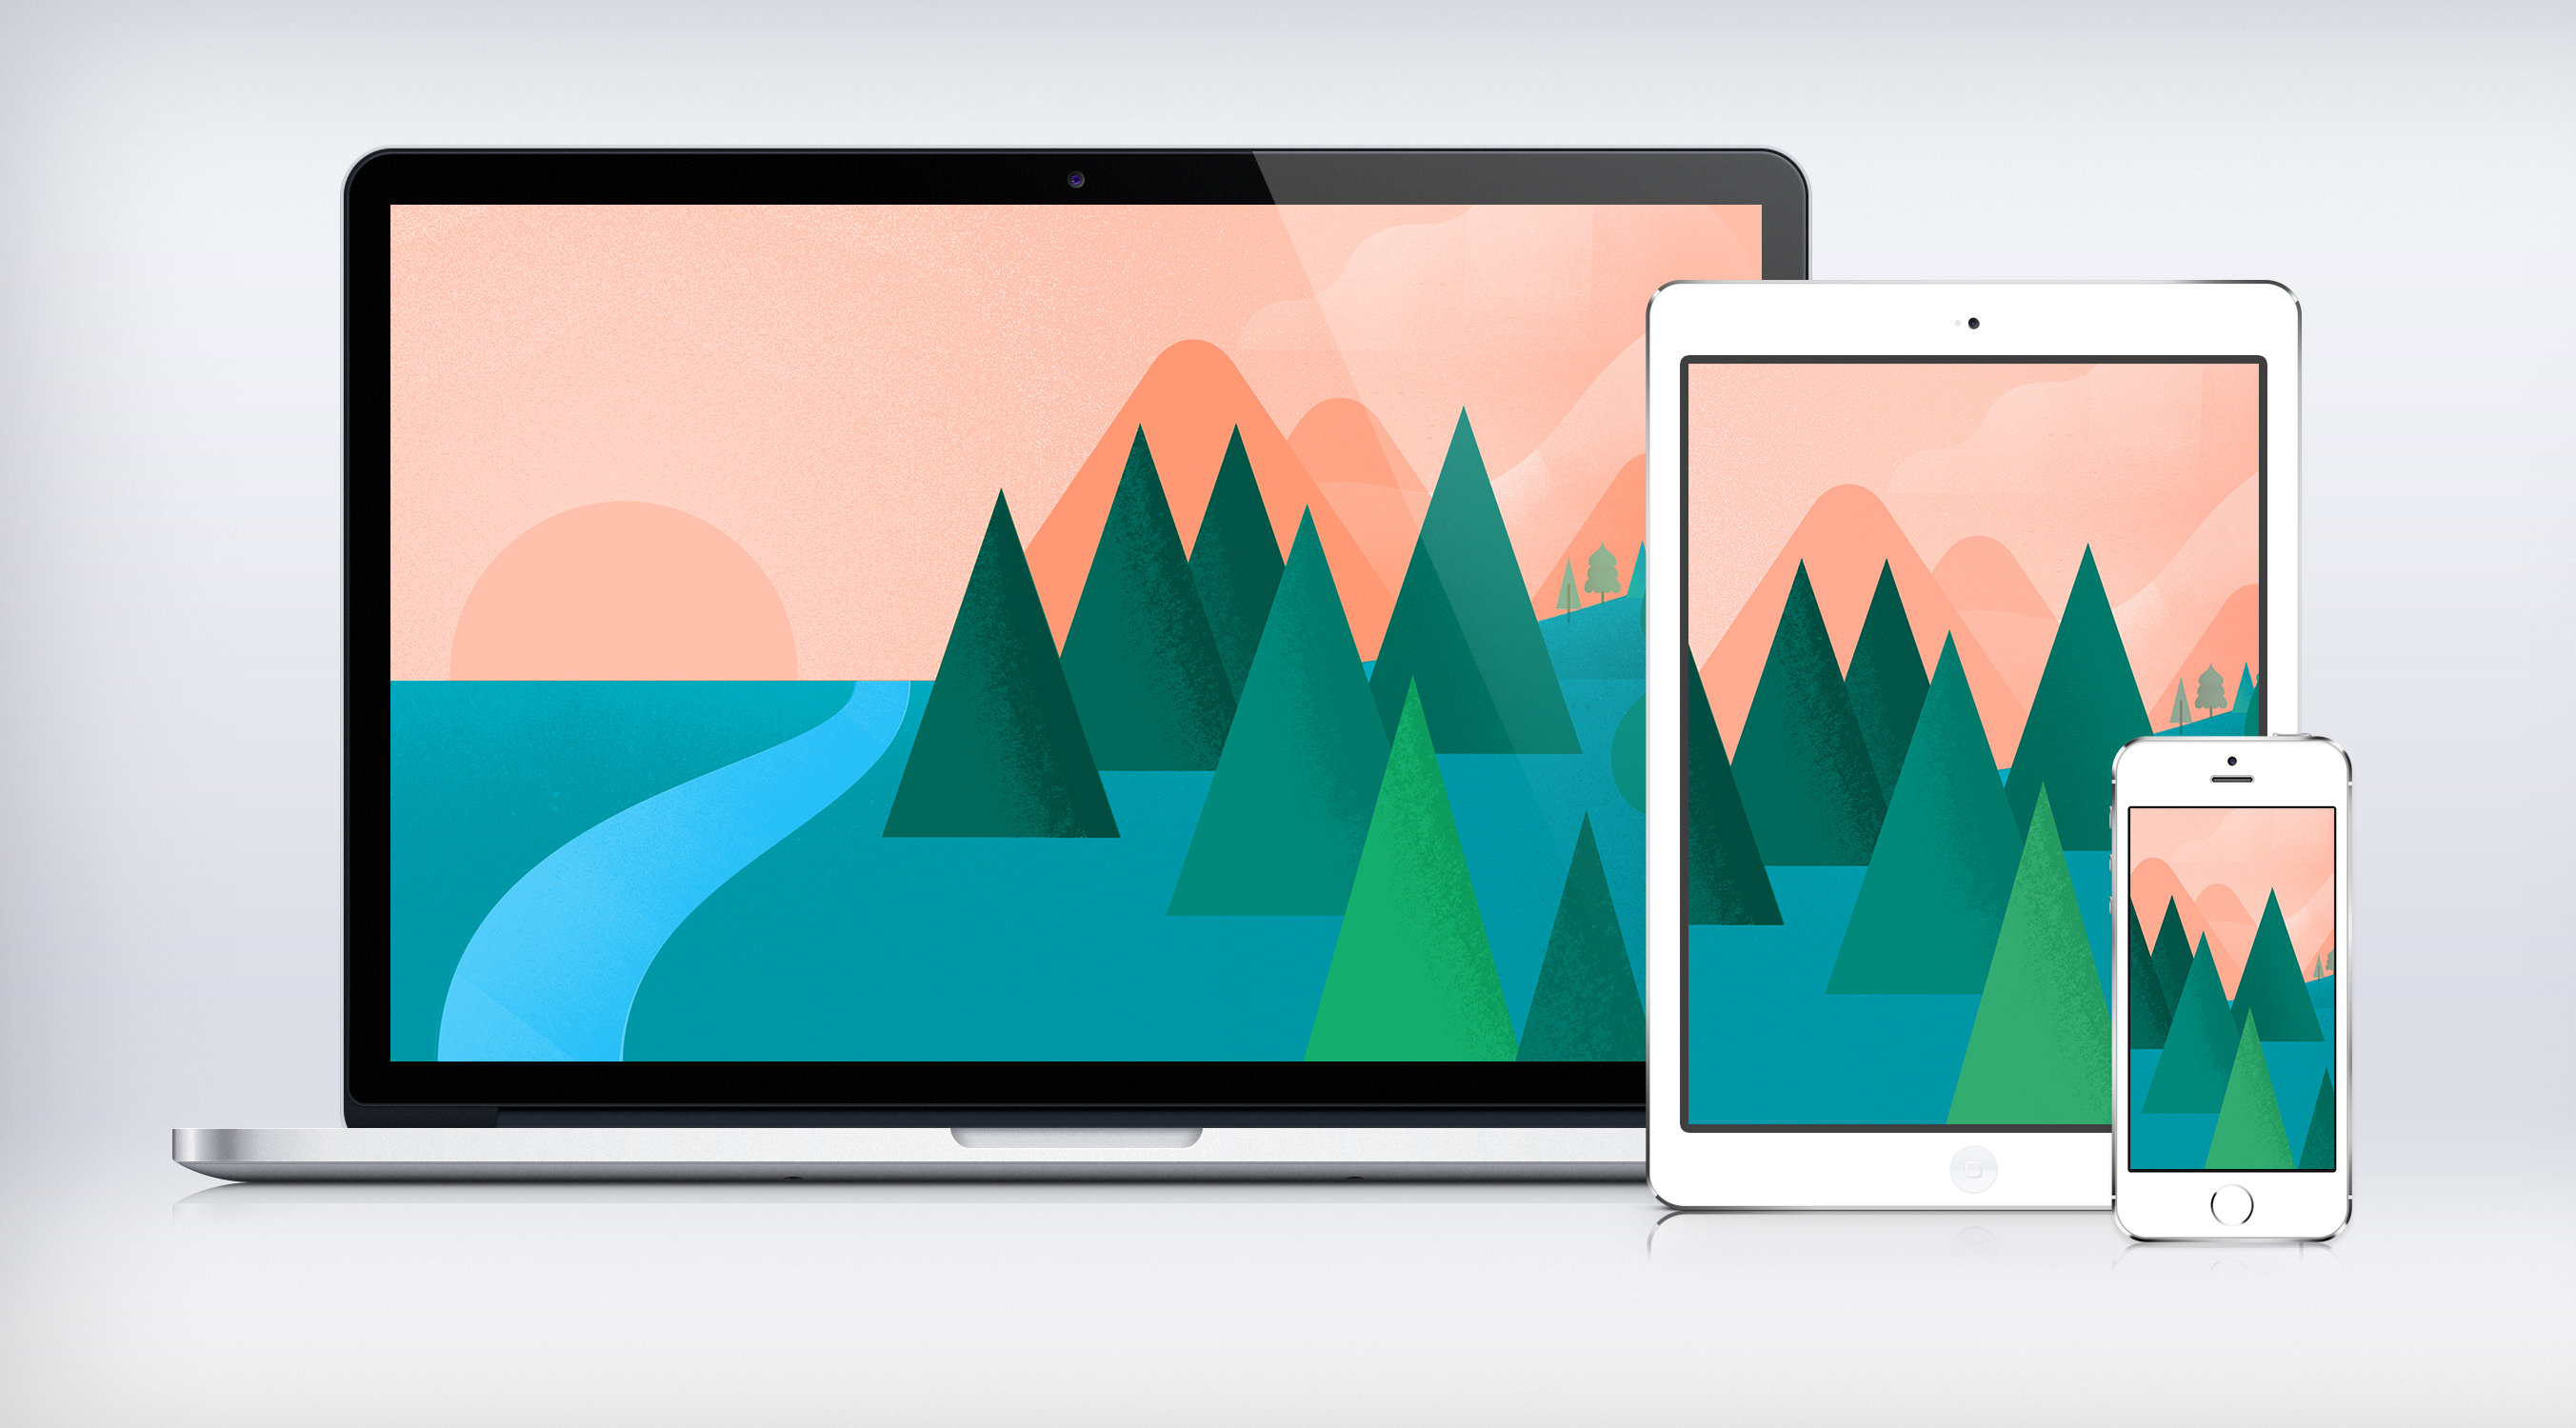 Google I/O Landscape Wallpaper Material Design by JasonZigrino